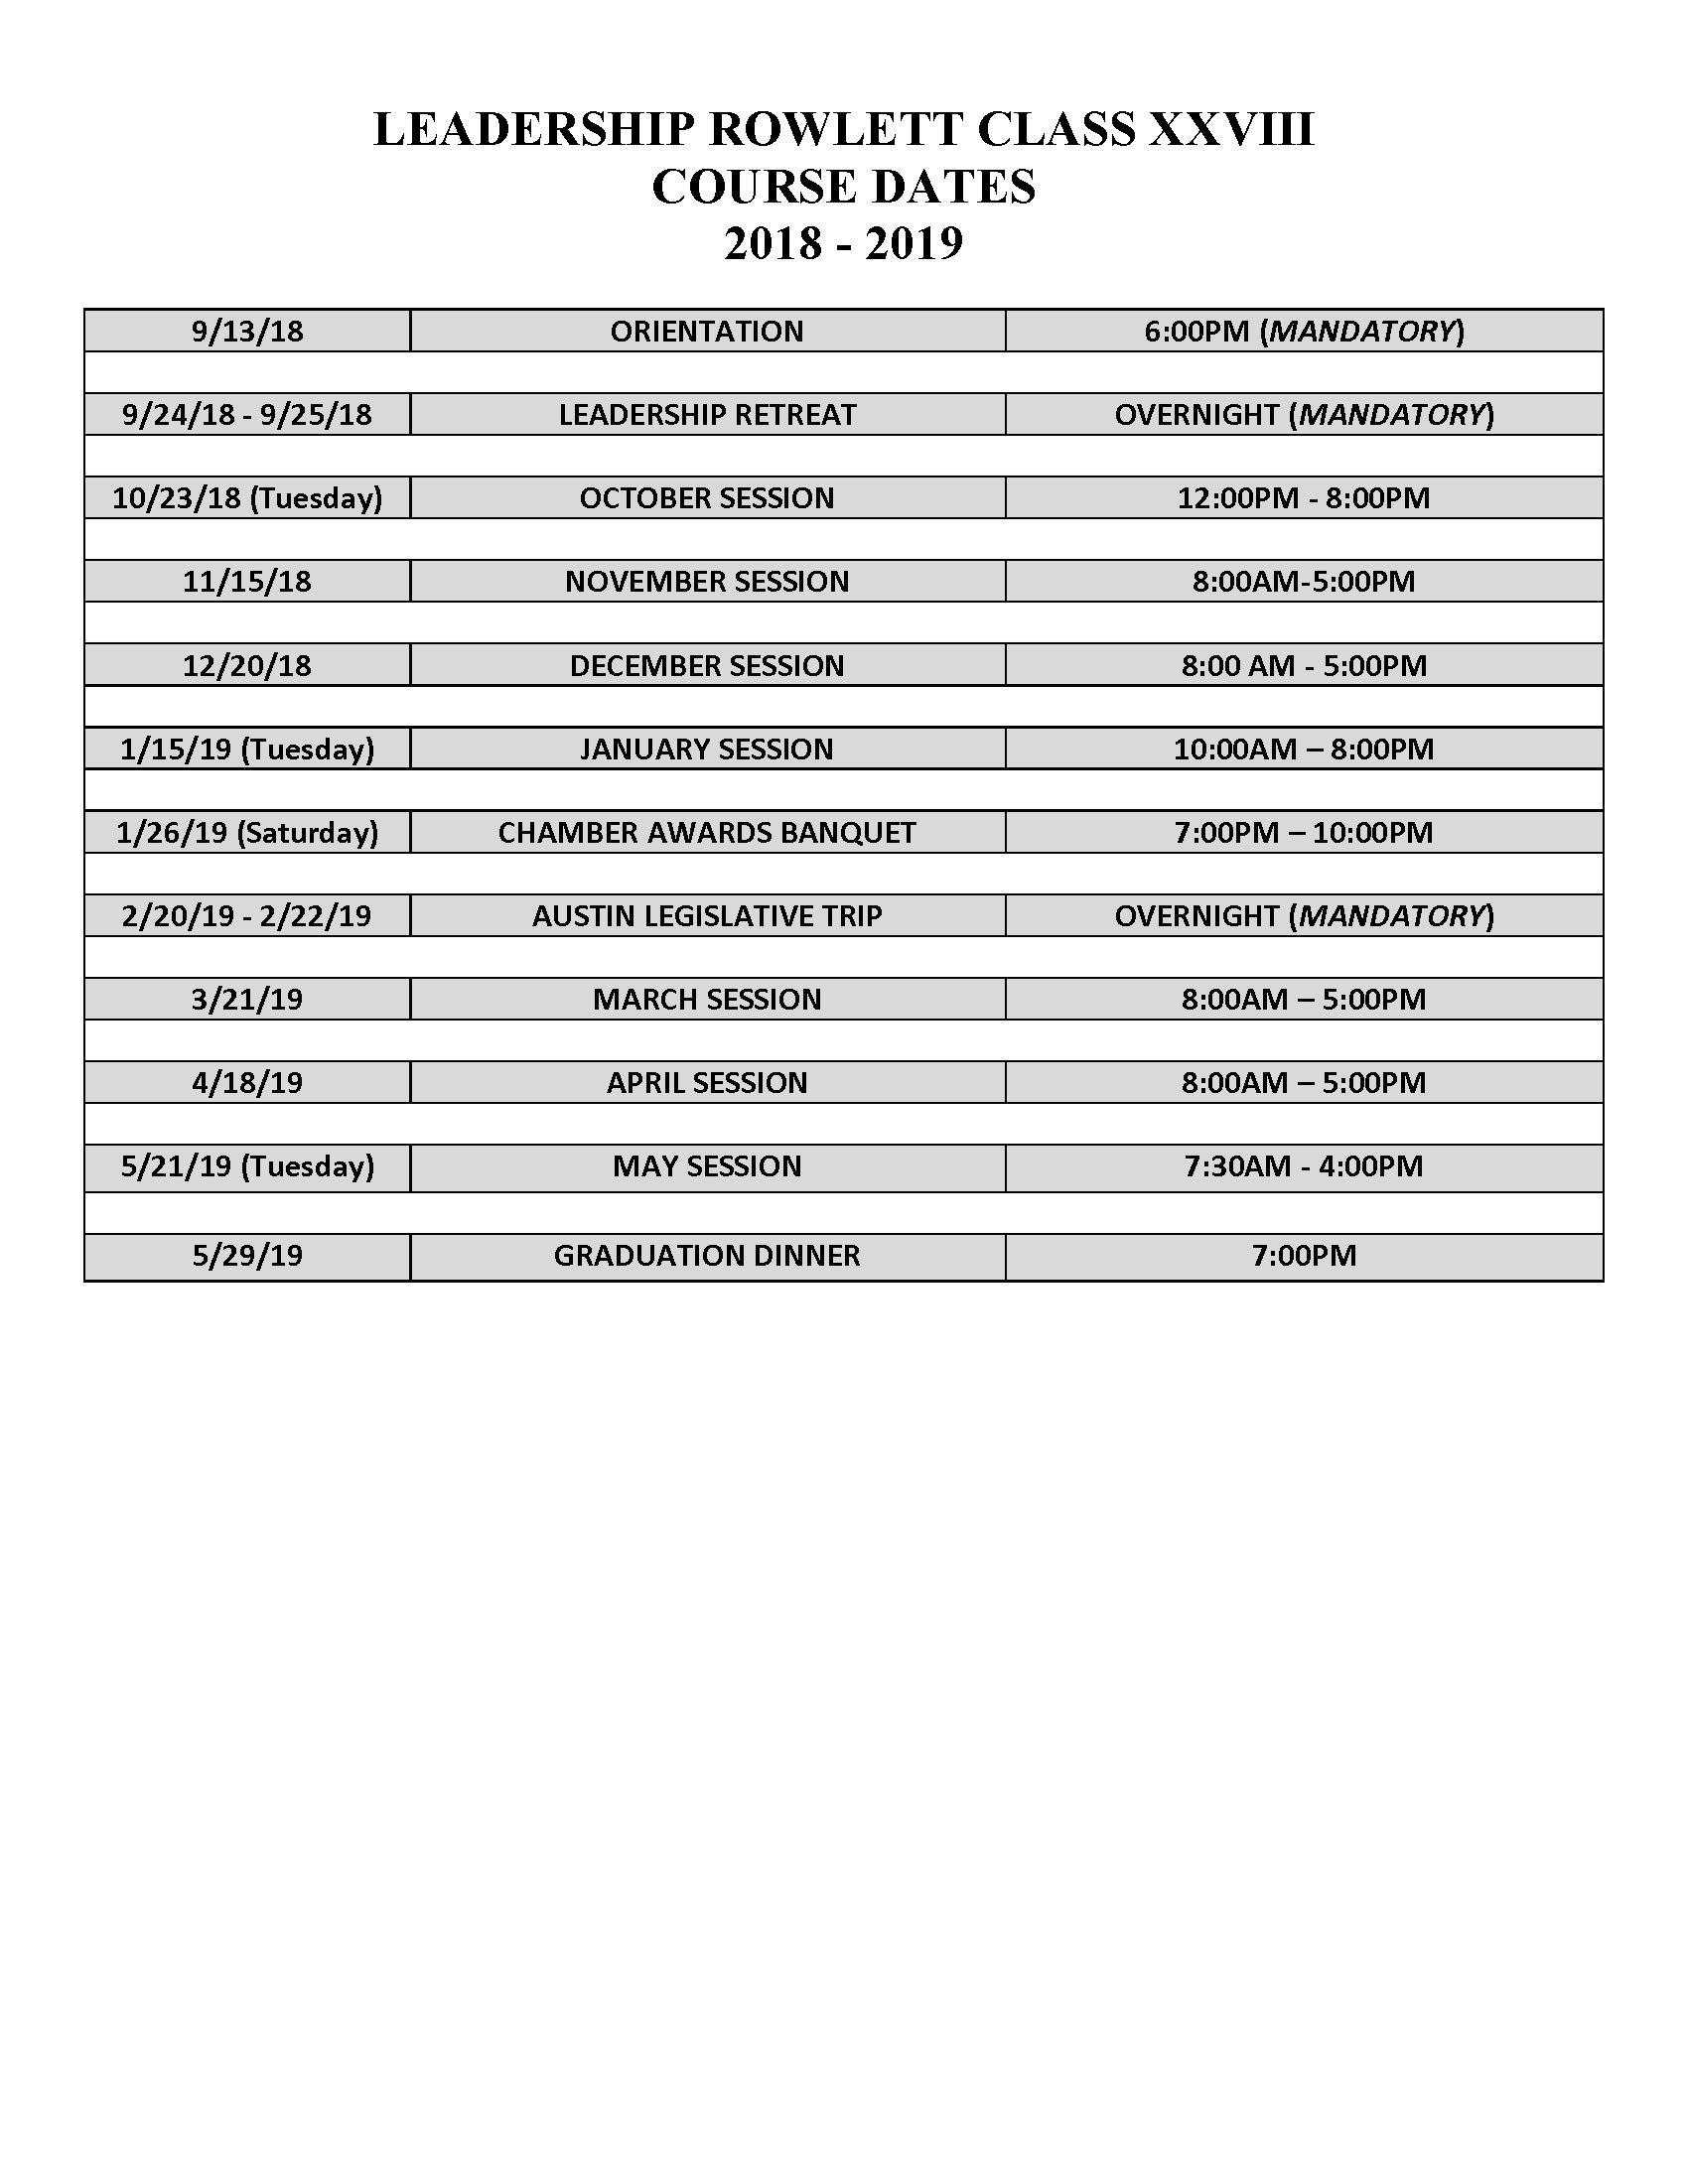 2018-2019 Leadership Rowlett Course Dates